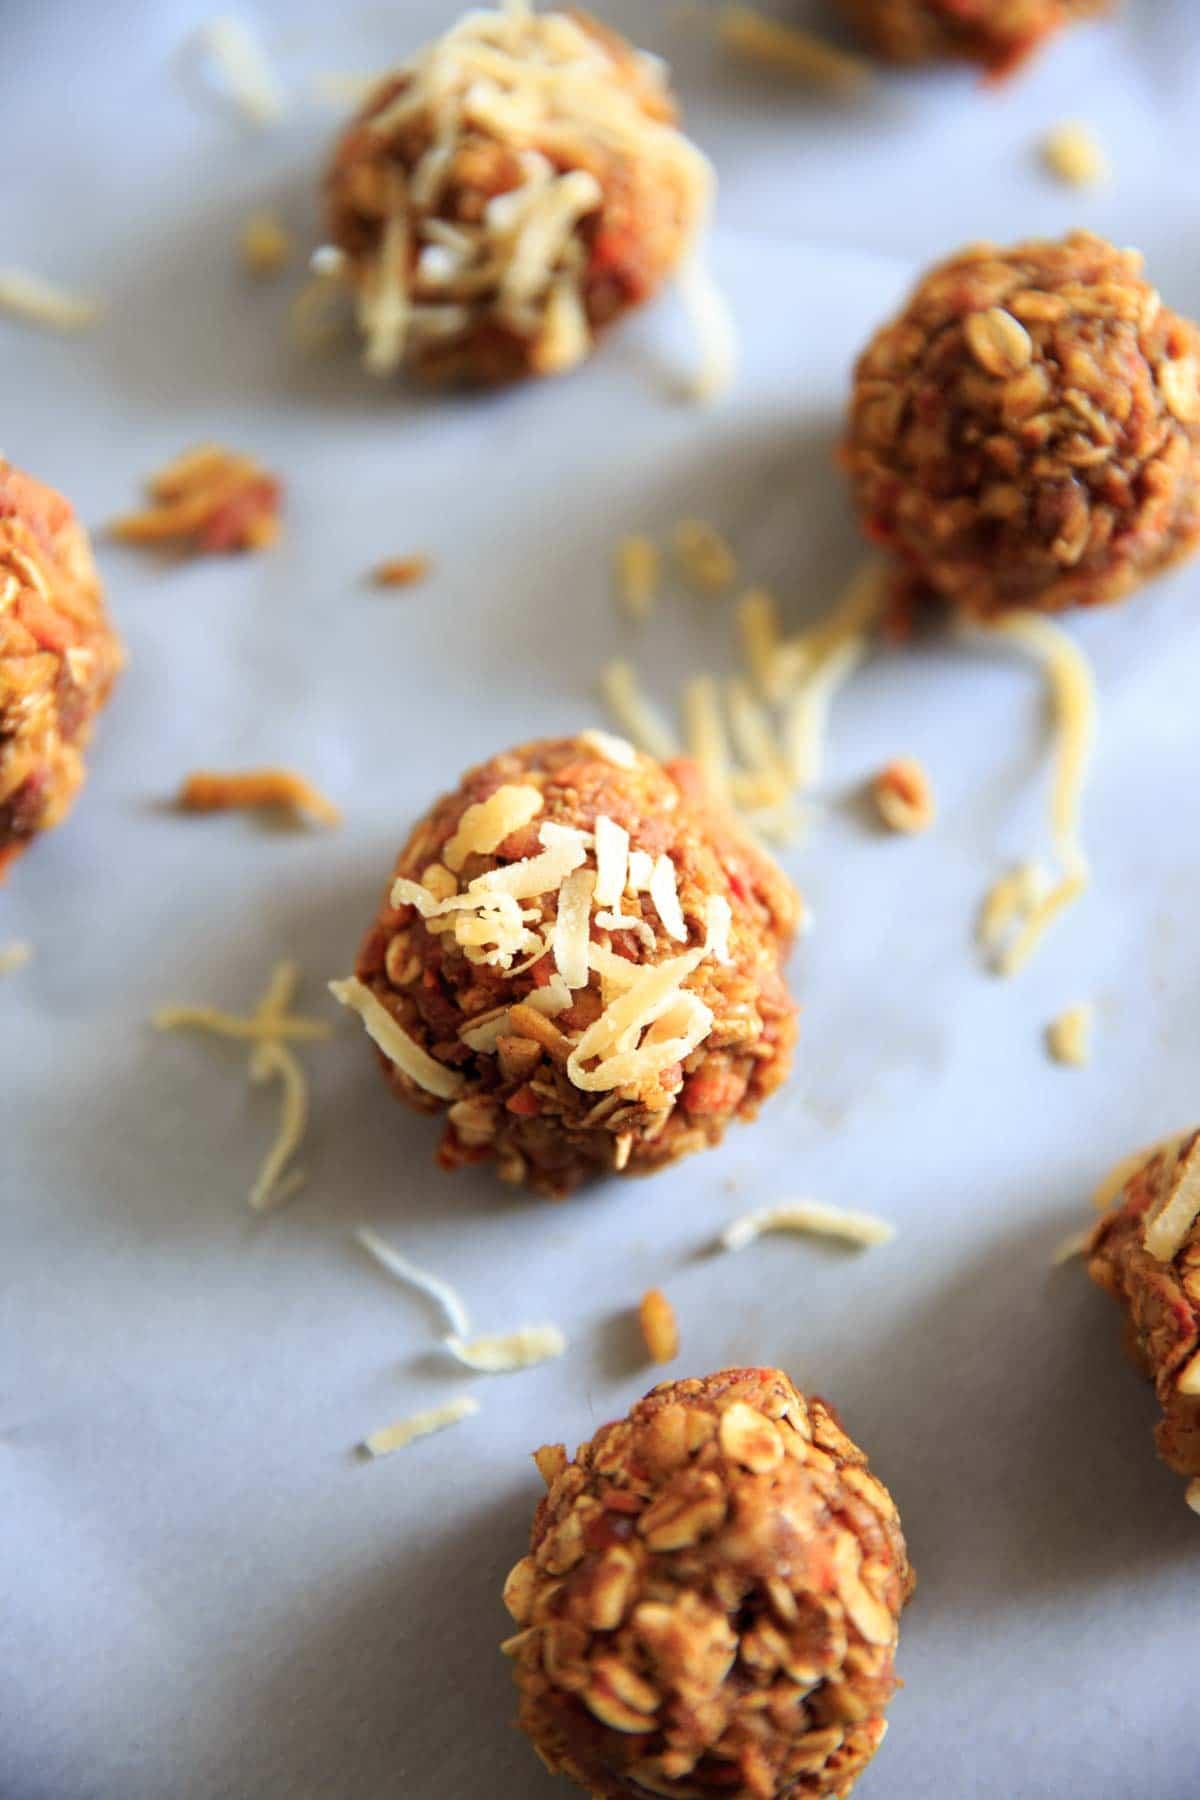 Vegan and gluten-free no-bake carrot cake energy bites. Quick easy snack that's healthy but tastes like dessert!